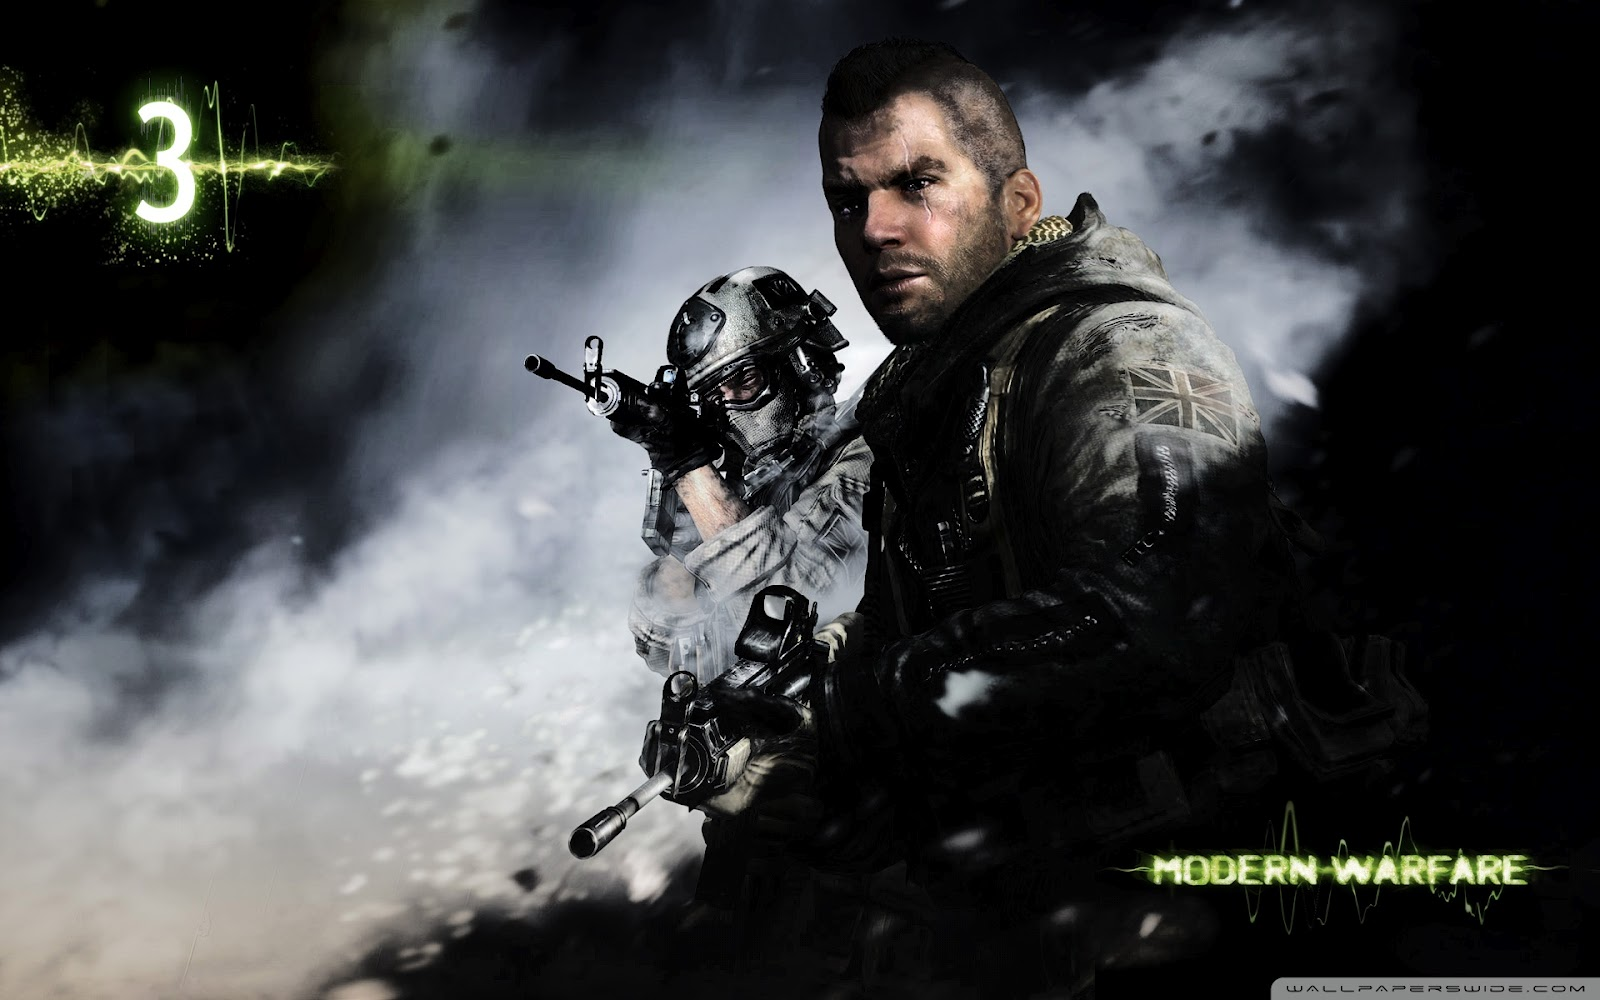 Freaking Spot: Call Of Duty Full HD 1080p Wallpapers